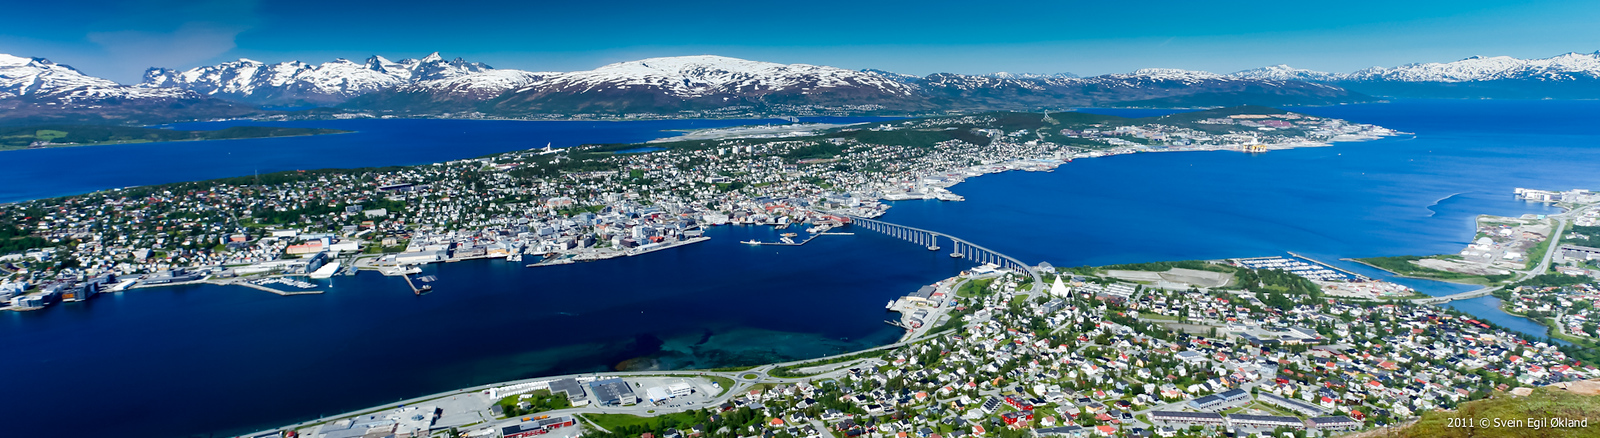 LM2011 Tromsø - RT & LC landsmøte